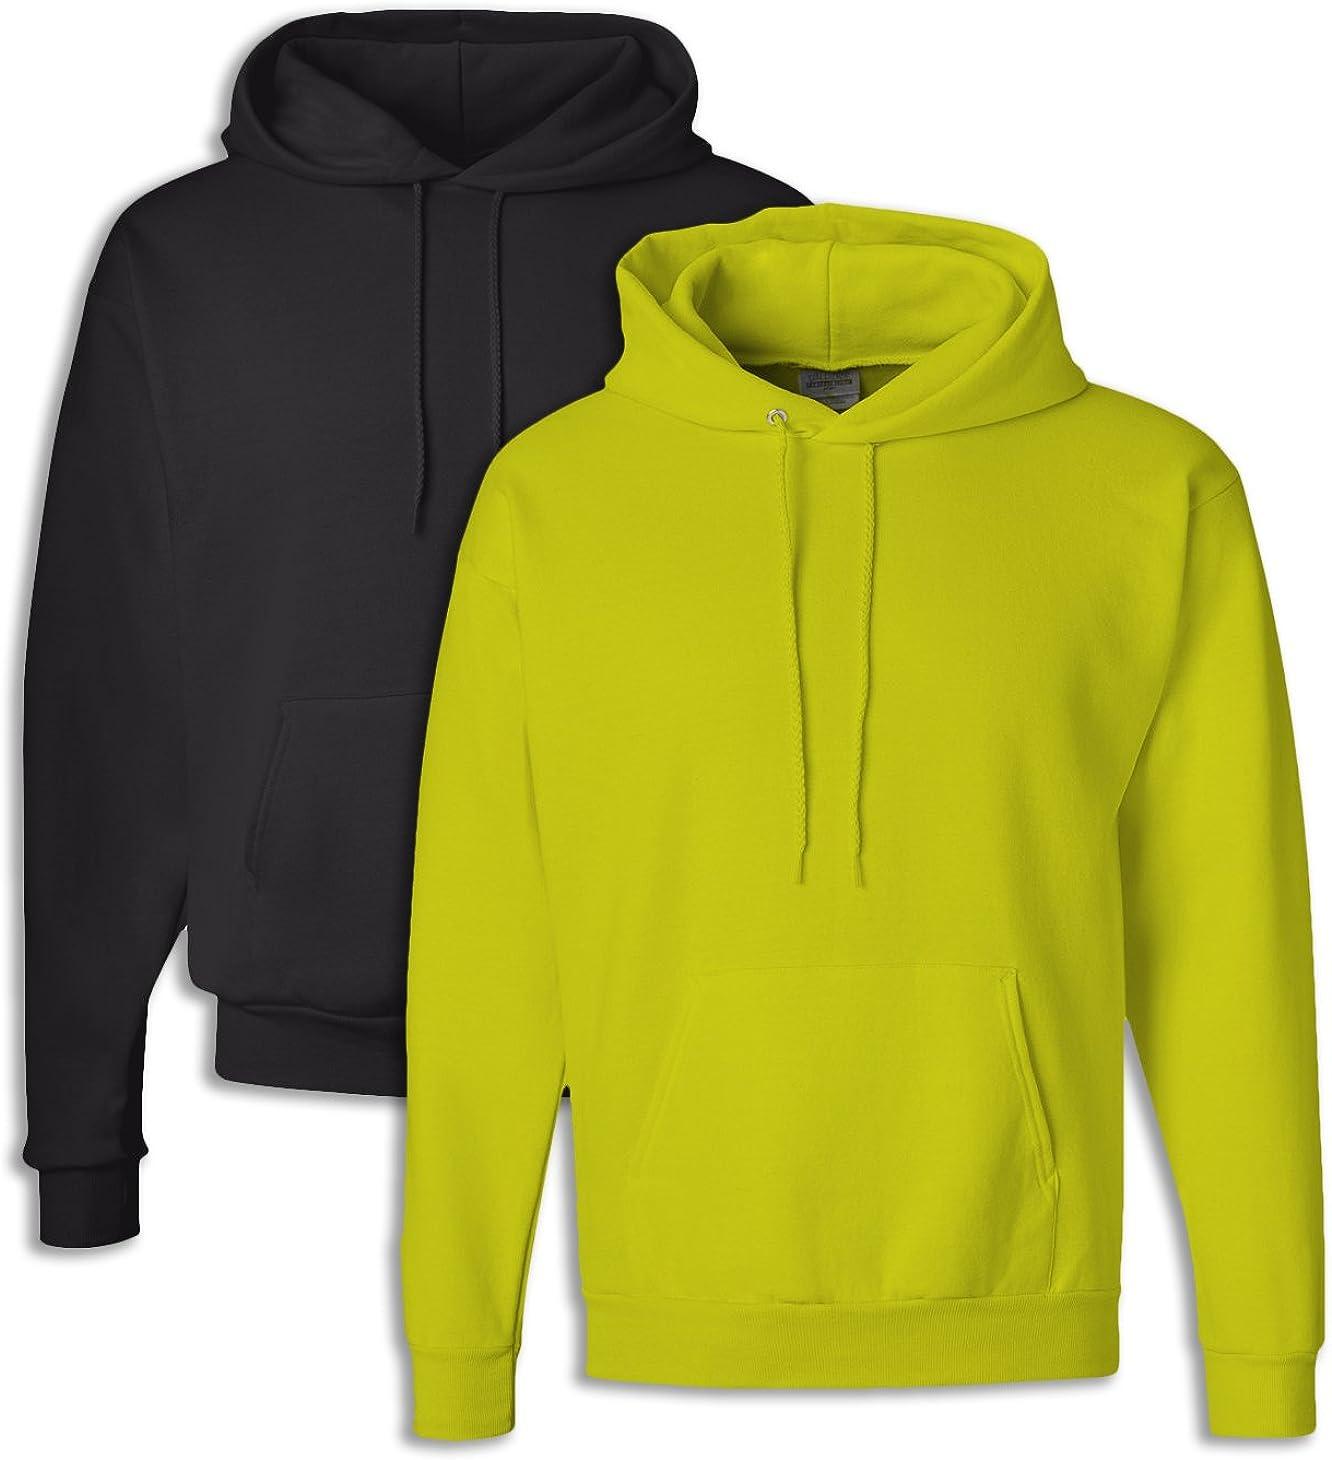 Hanes P170 Mens EcoSmart Hooded Sweatshirt 2XL 1 Black 1 Safety Green